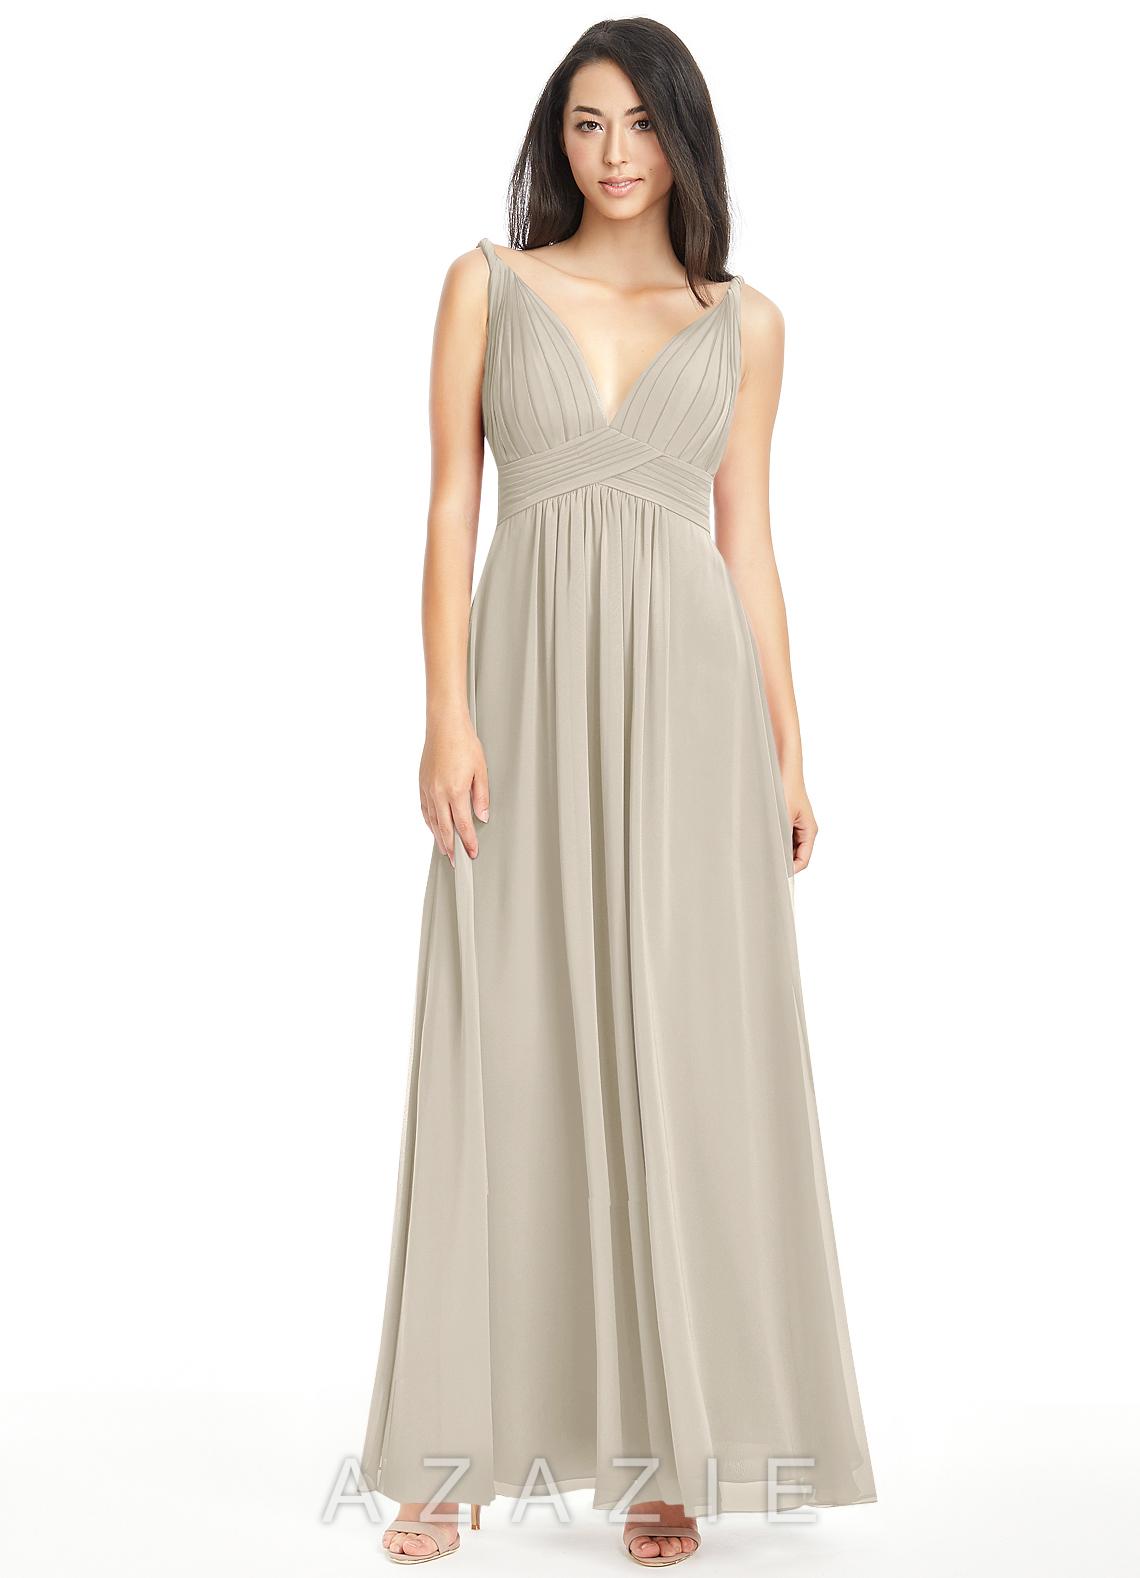 Azazie maren bridesmaid dress azazie color taupe ombrellifo Gallery